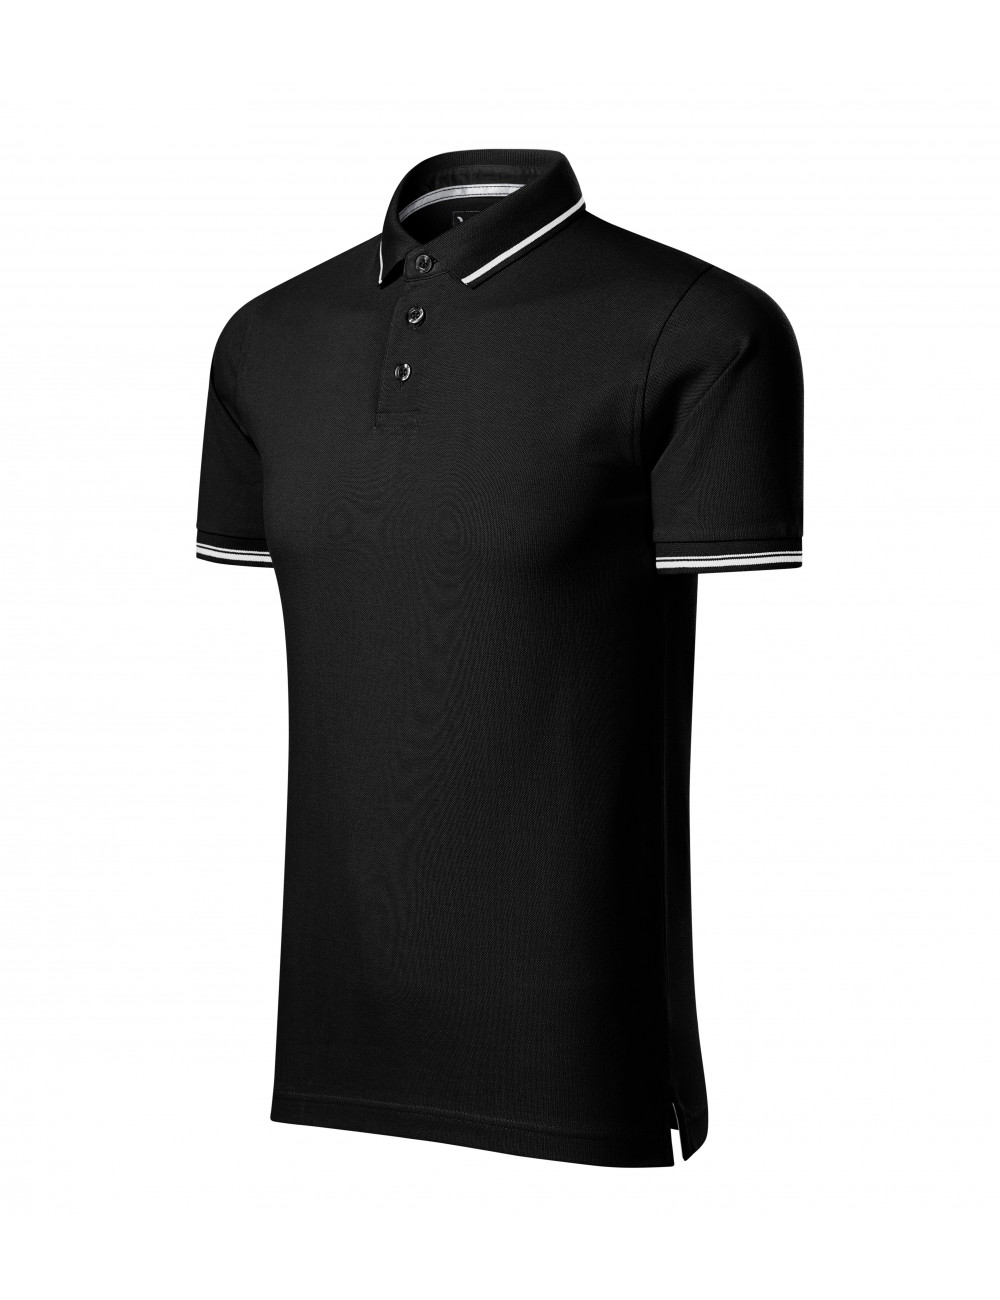 Adler MALFINIPREMIUM Koszulka polo męska Perfection plain 251 czarny